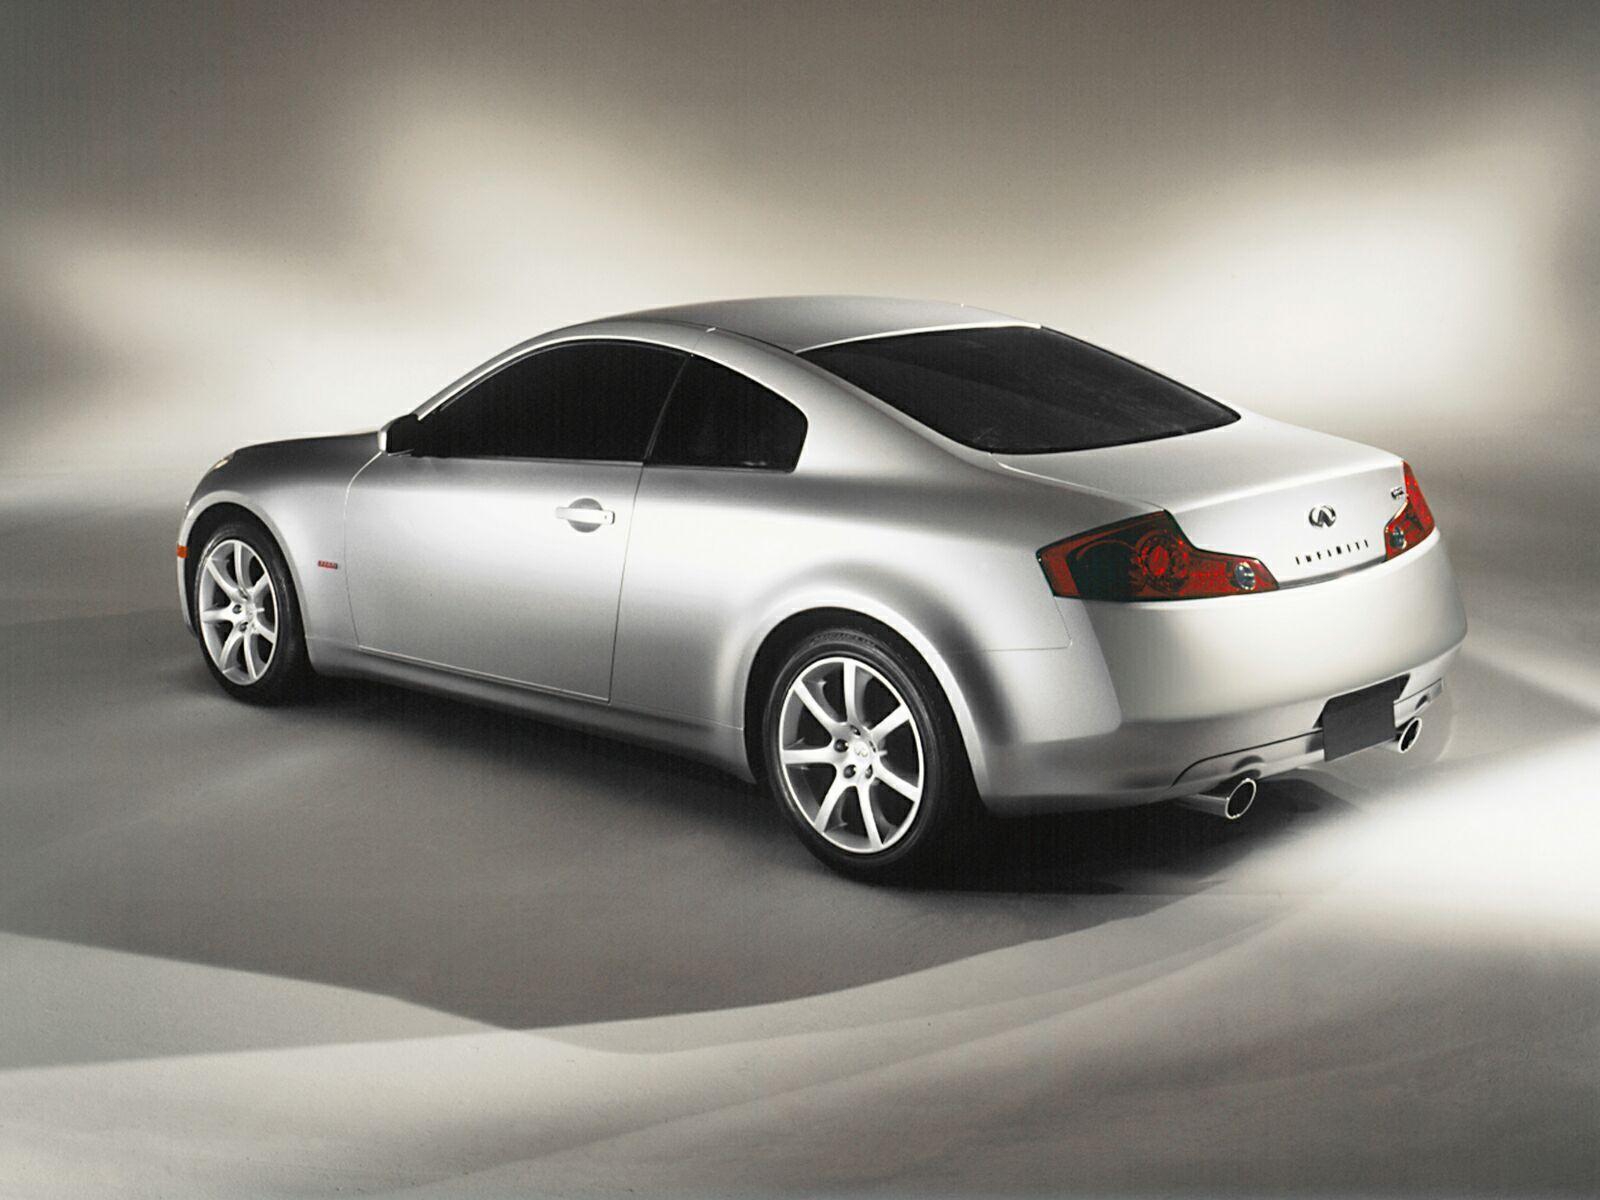 Infiniti g35 wallpaper hd infiniti pinterest coupe cars and jdm vanachro Gallery